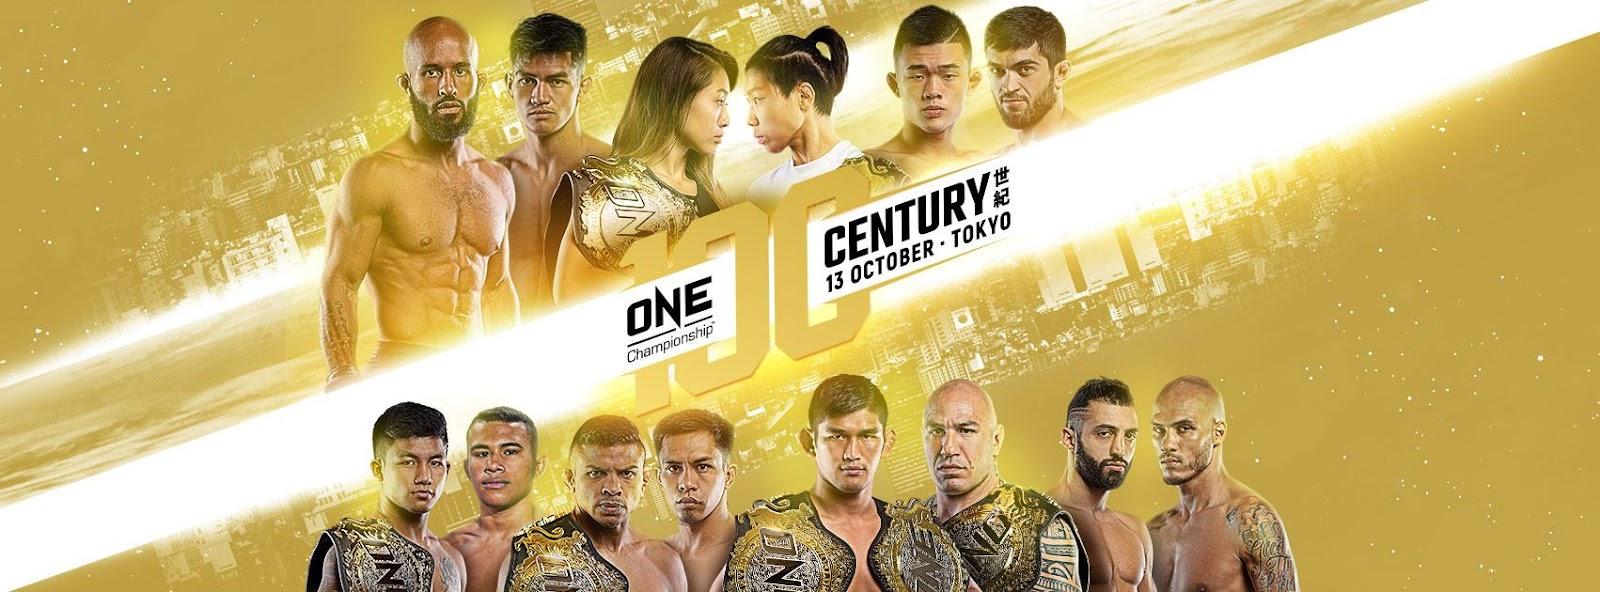 ONE Championship, ONE: CENTURY, xem trực tiếp ONE Championship, Làm thế nào để xem trực tiếp ONE: CENTURY tại Việt Nam